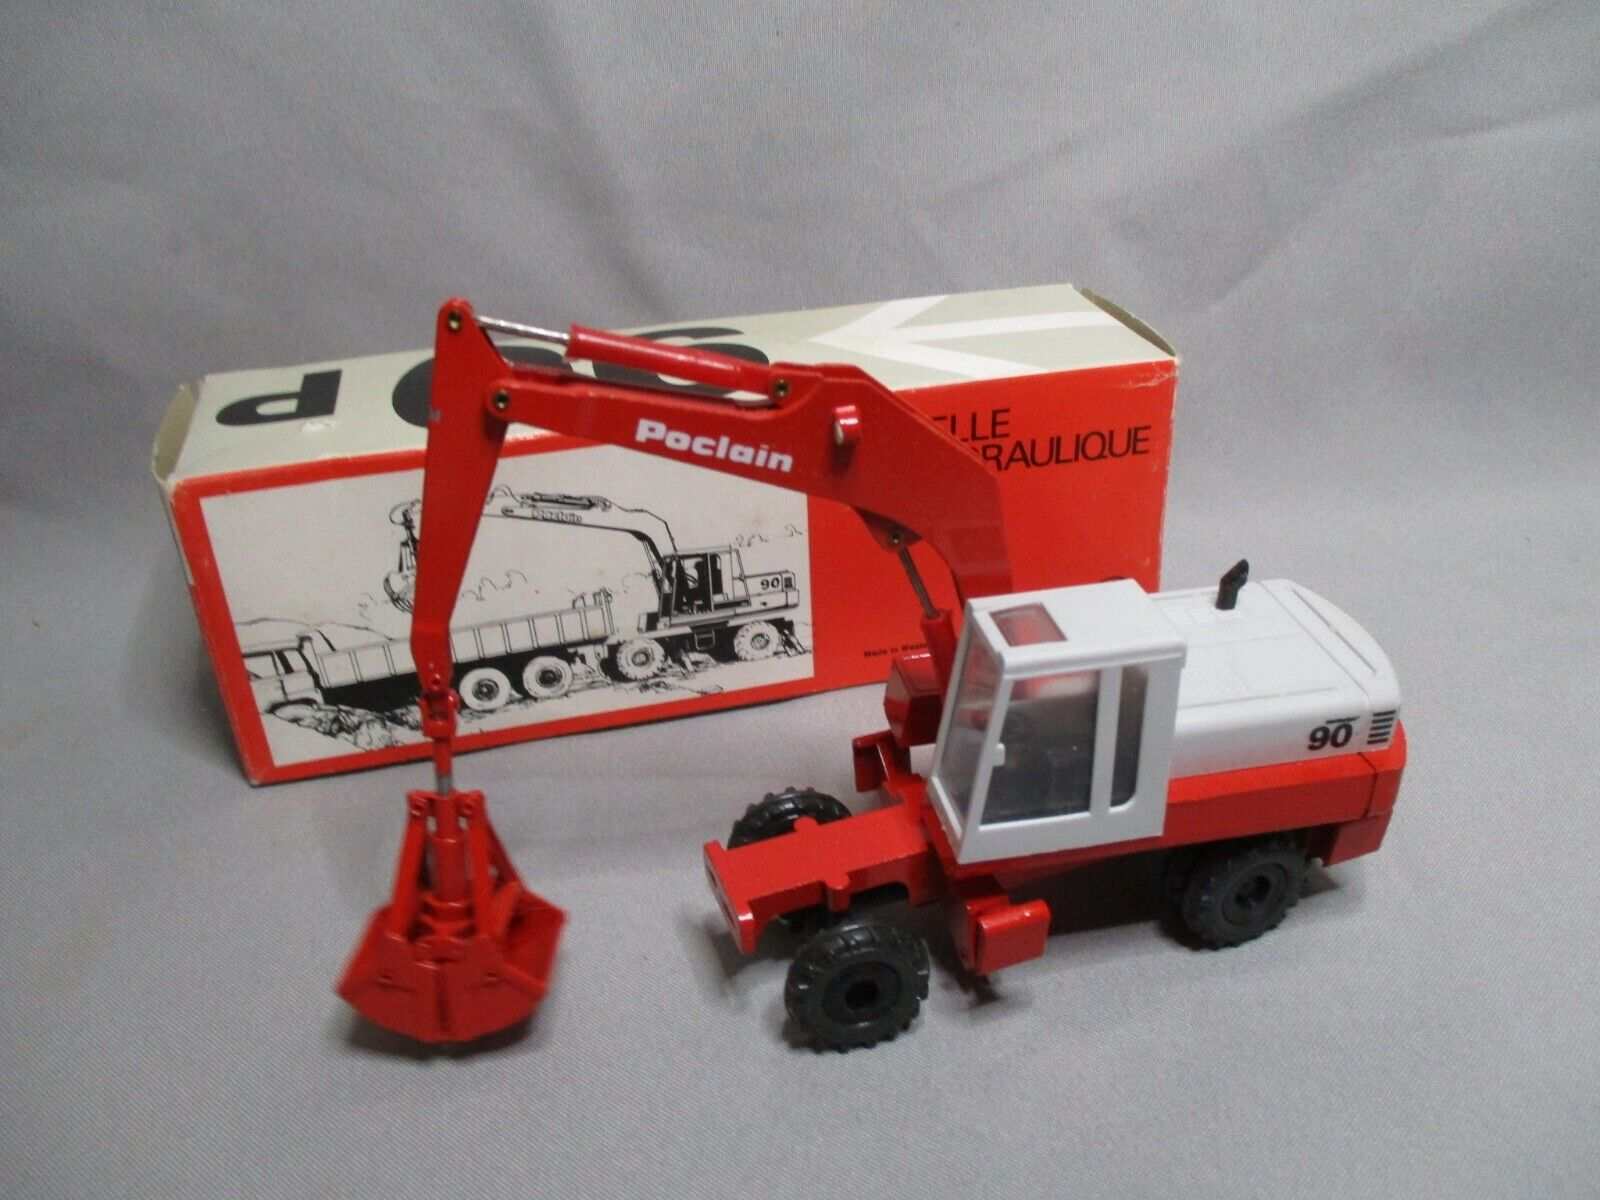 Ak305 gescha 1 50 poclain hydraulic excavator 90p ref 896 good condition